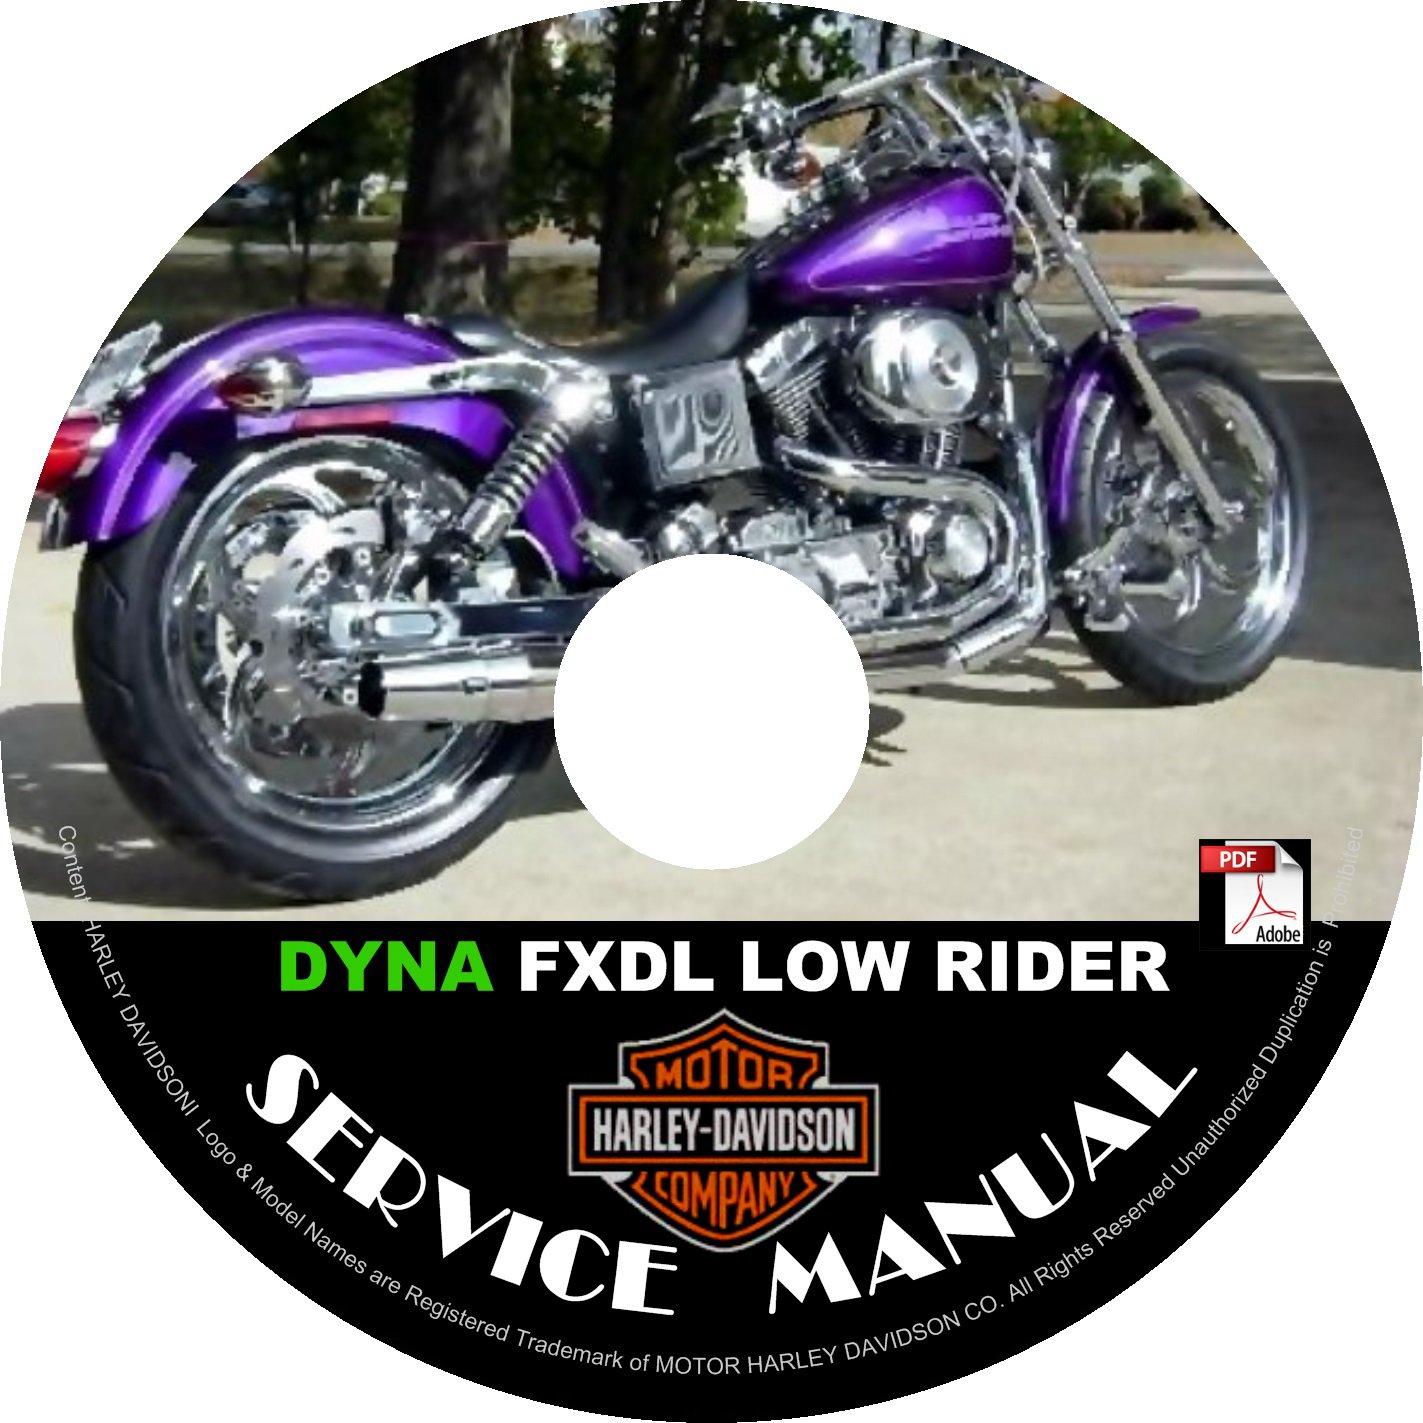 2002 Harley Davidson FXDL Dyna Low Rider Service Repair Shop Manual on CD Fix Rebuild '02 Workshop